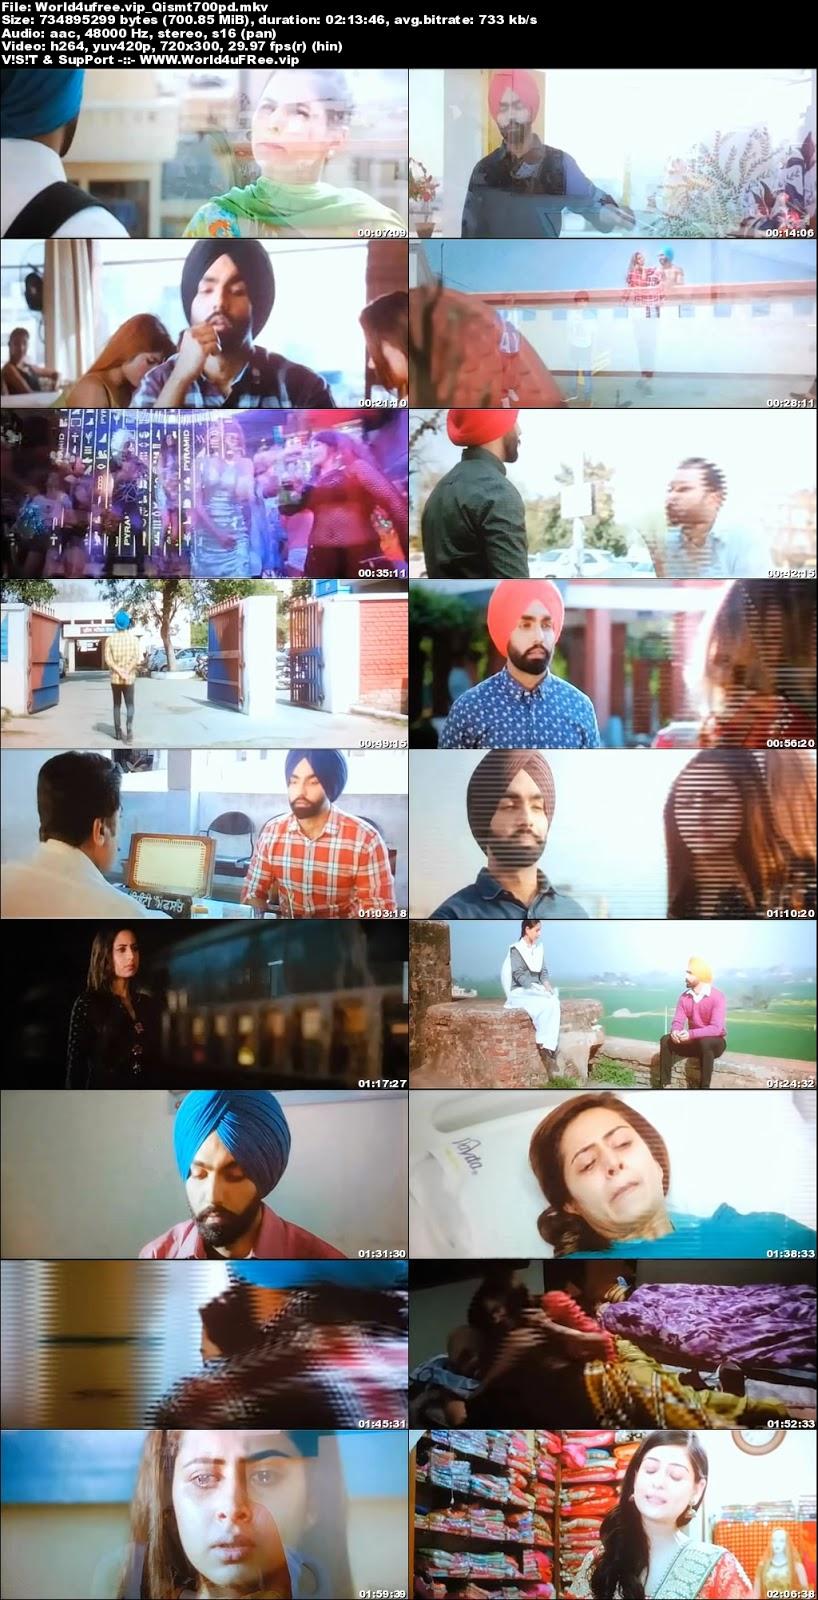 Qismat 2018 Punjabi Movie Pre-DVDRip 700Mb Download world4ufree.vip , hindi movie Qismat 2018 hdrip 720p bollywood movie Qismat 2018 720p LATEST MOVie Qismat 2018 720p DVDRip NEW MOVIE Qismat 2018 720p WEBHD 700mb free download or watch online at world4ufree.vip